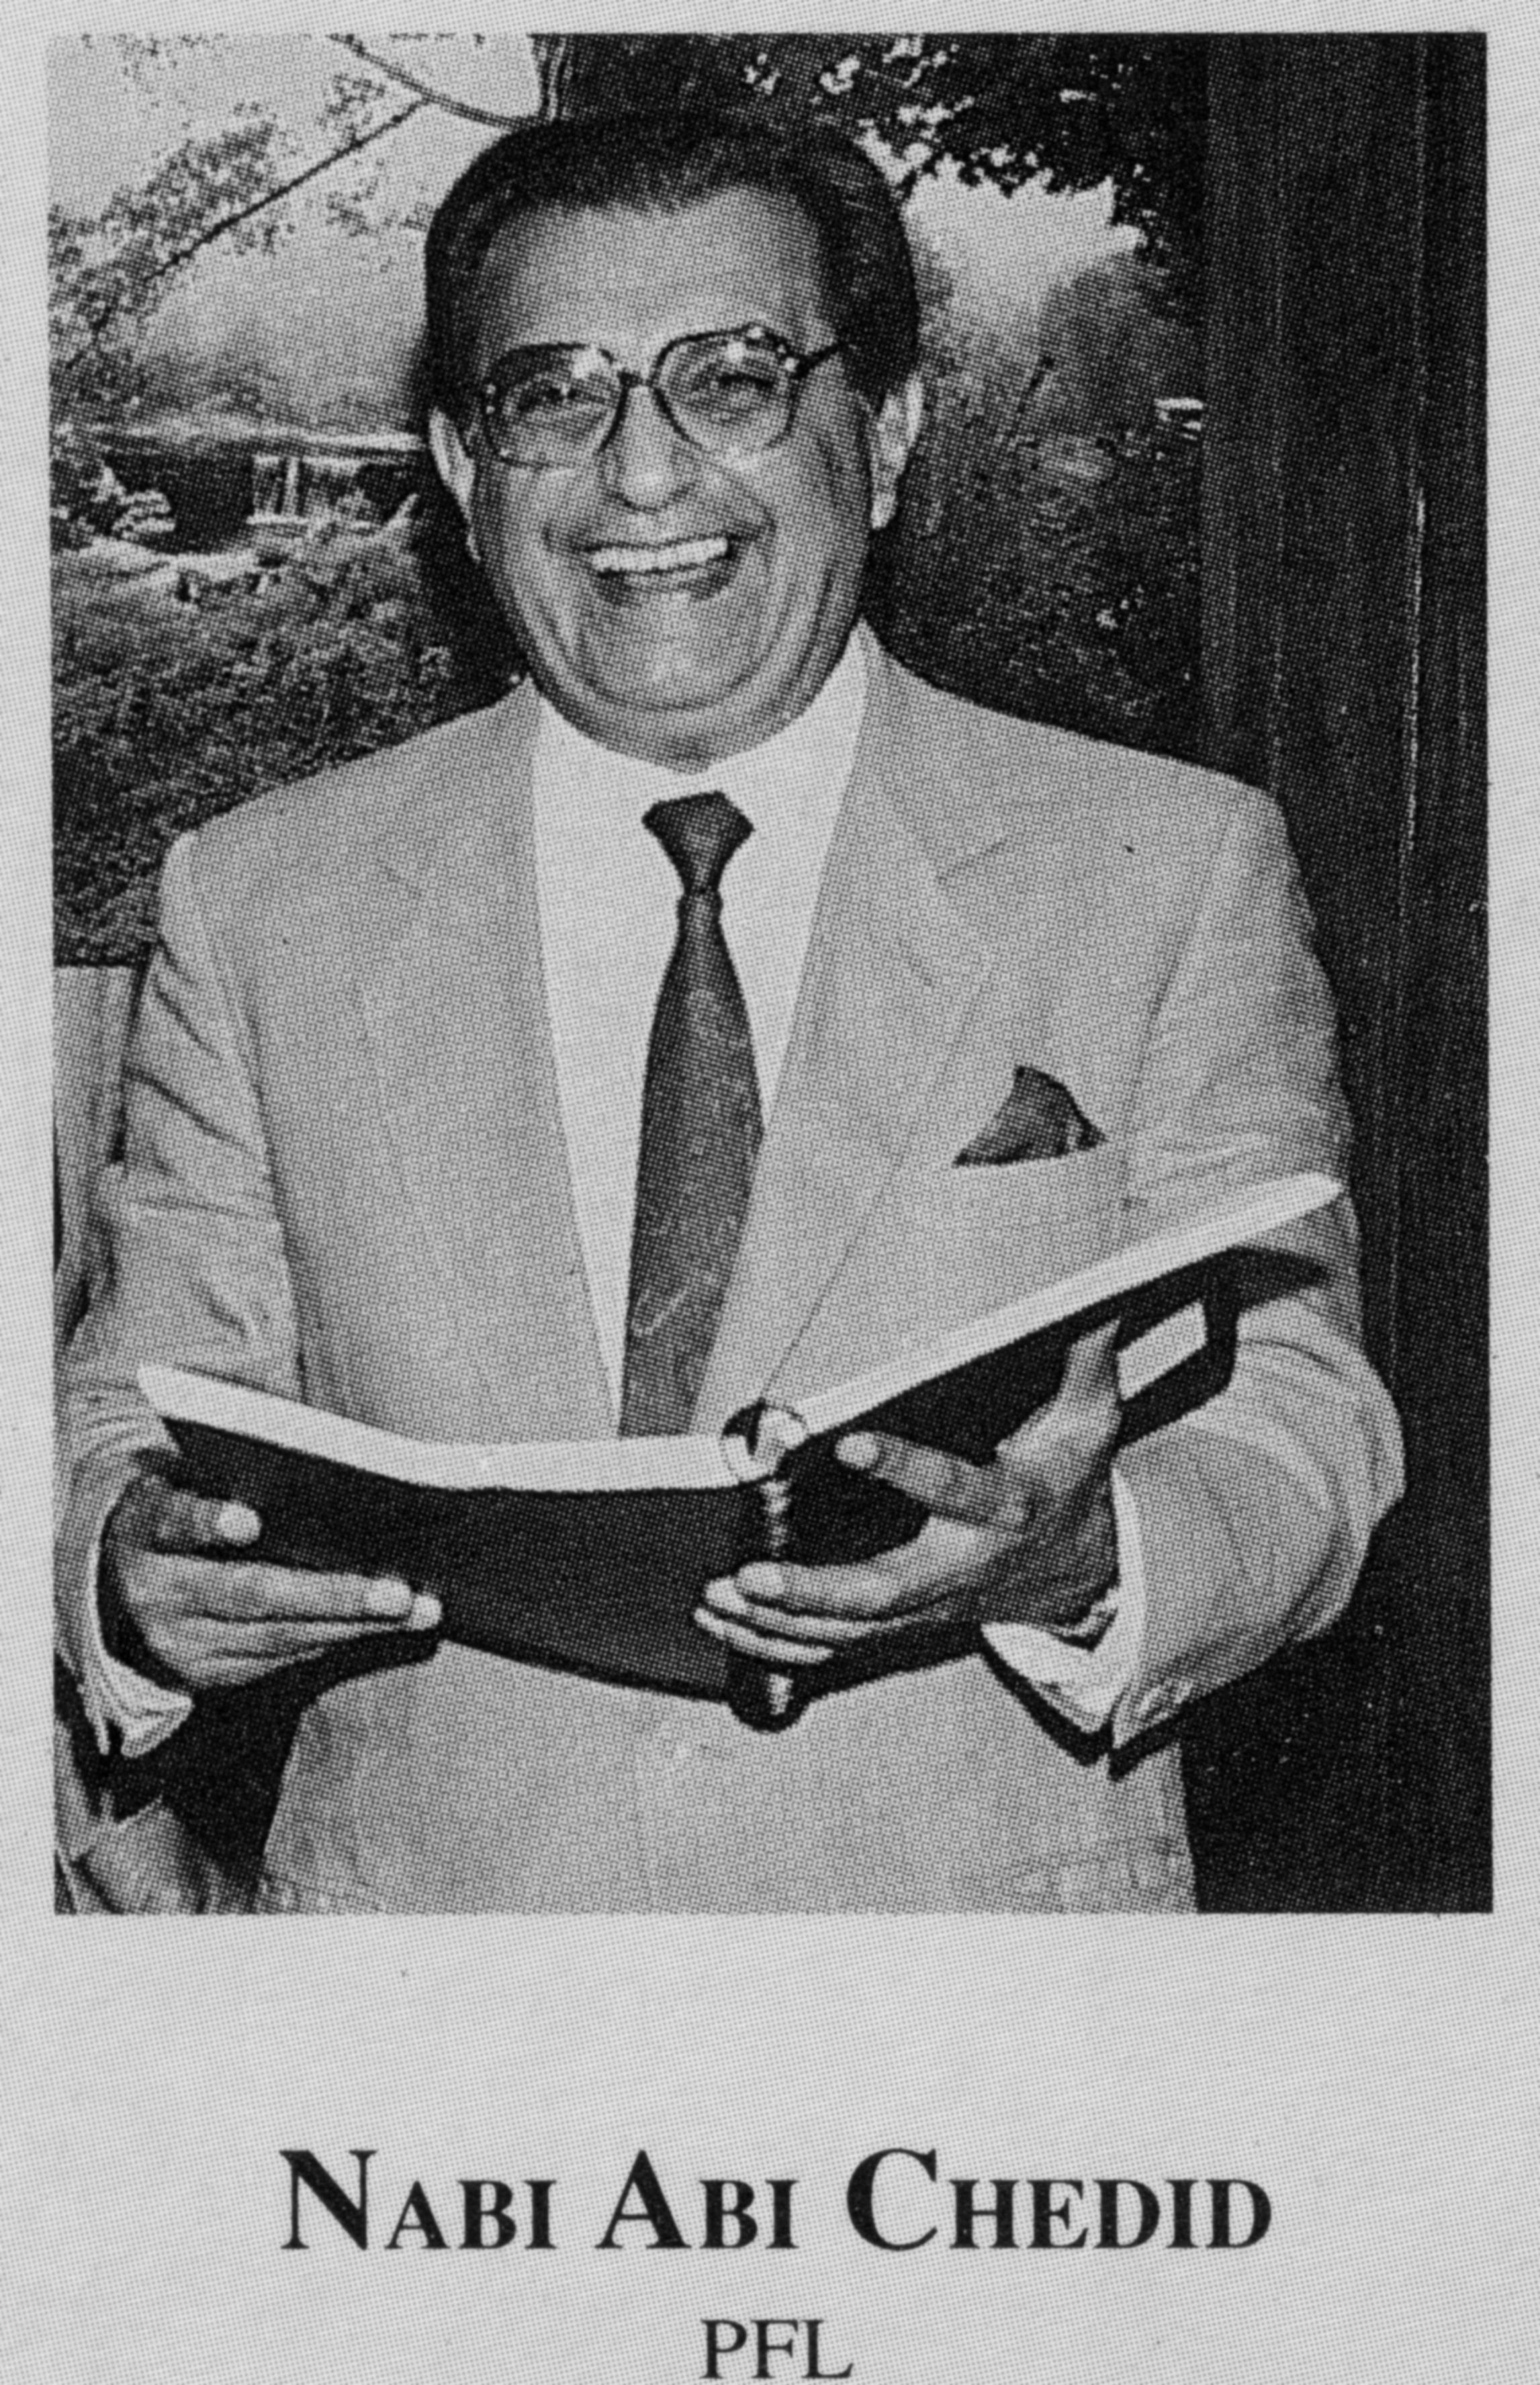 Nabi Abi Chedid – Wikipédia, a enciclopédia livre